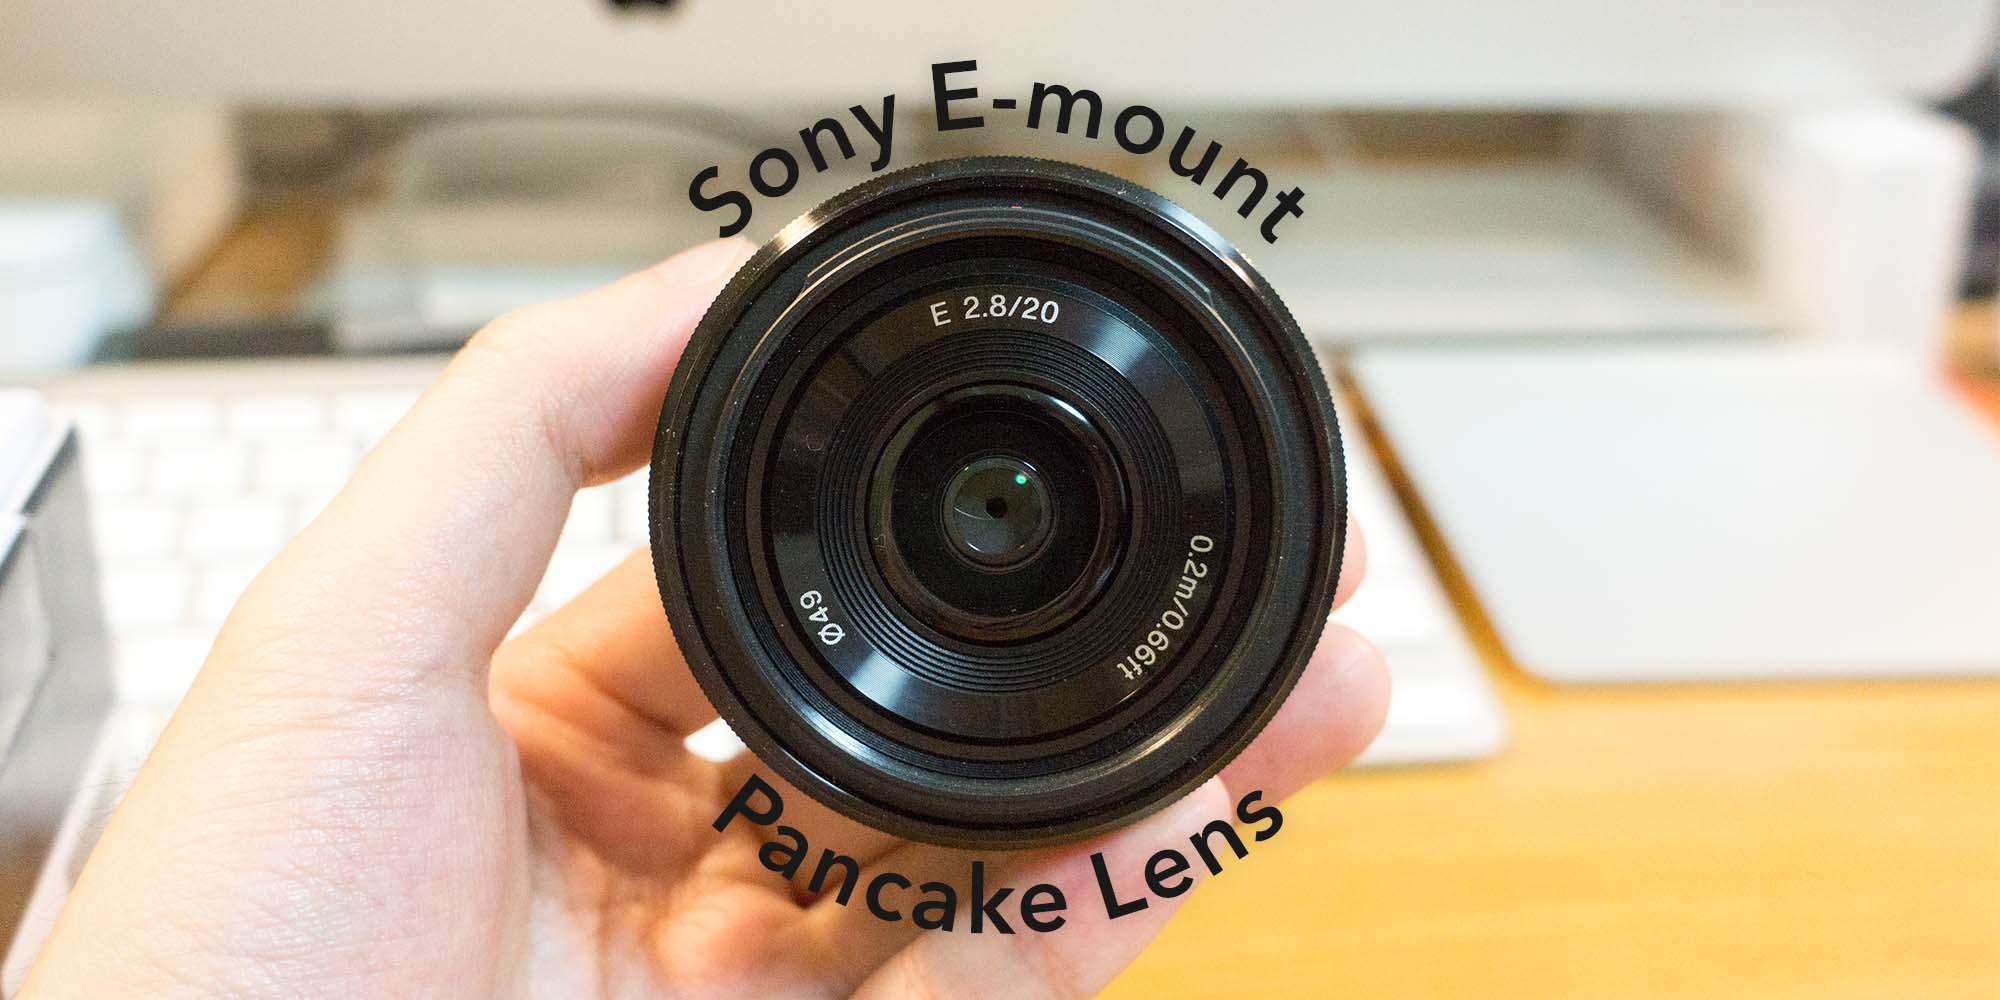 sony_e-mount_pancake_lens